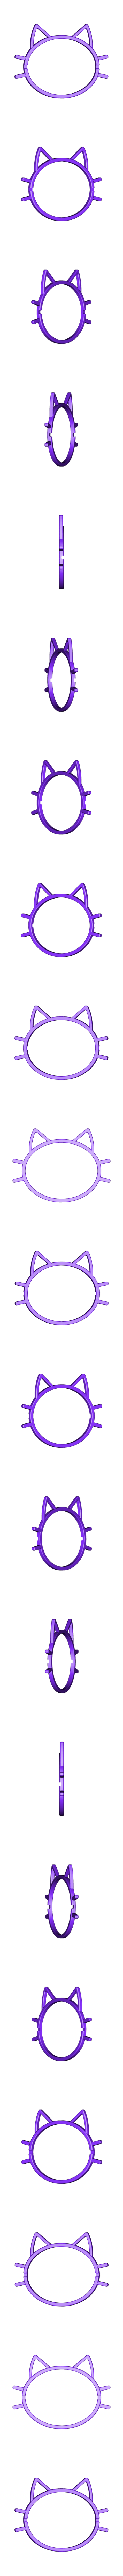 CatHClip.STL Download free STL file Cat hair/bun Clip • 3D printable design, Vexelius